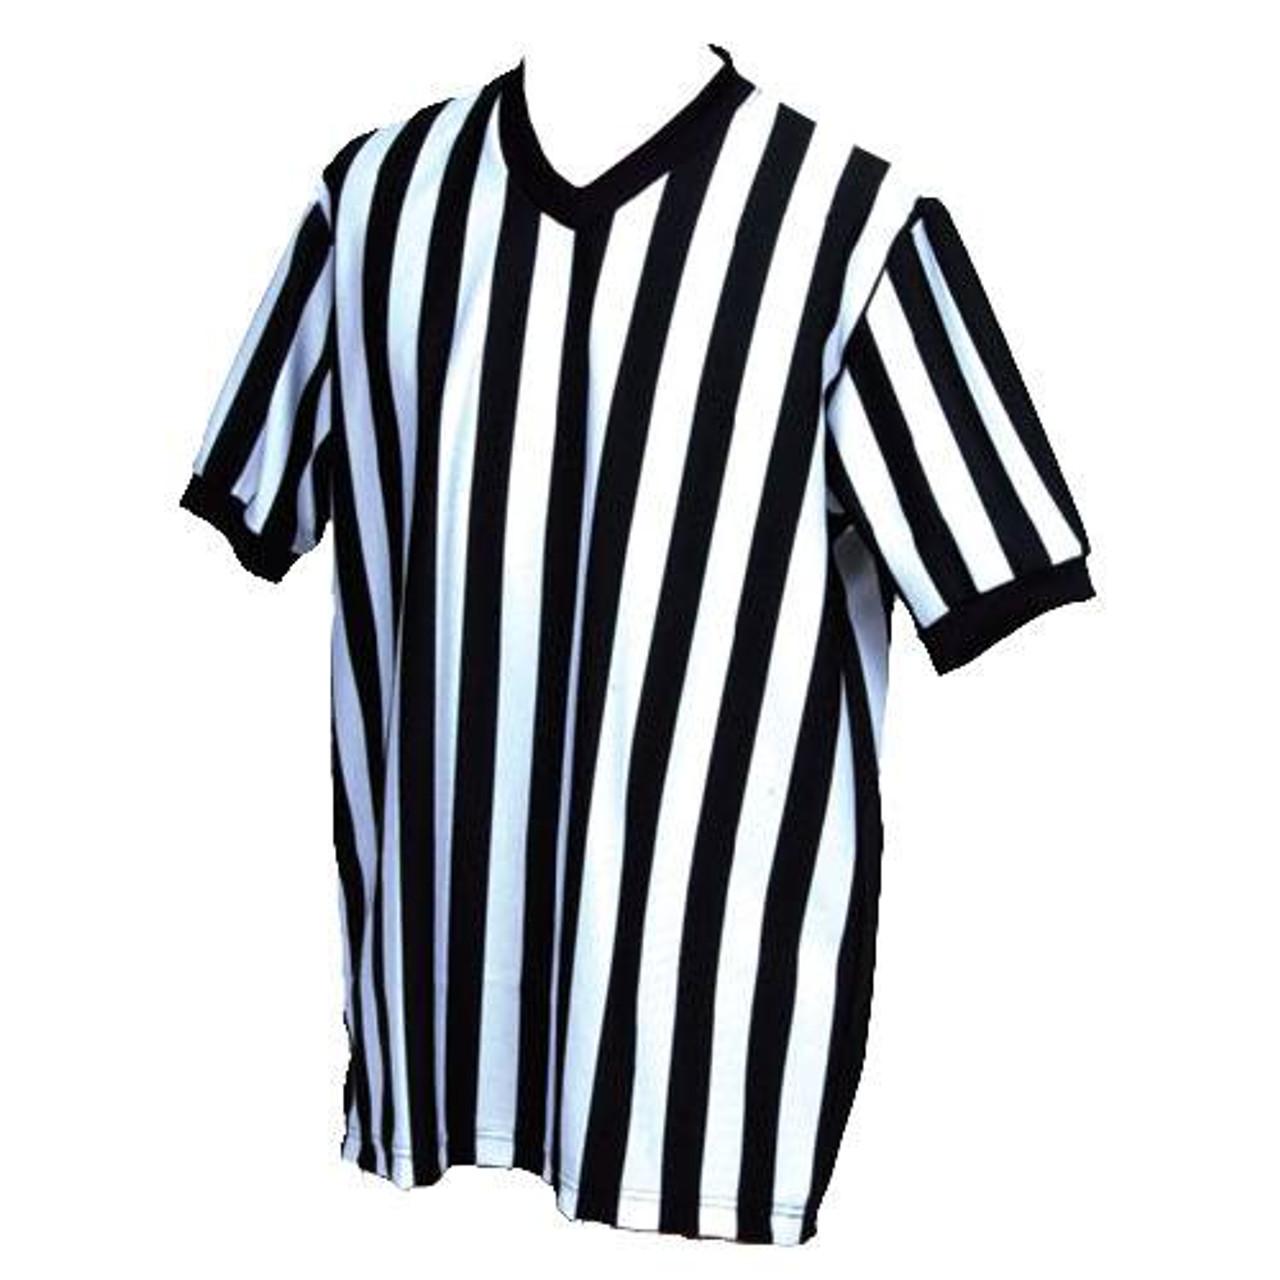 Referee/Officials V-Neck Jersey XXXL